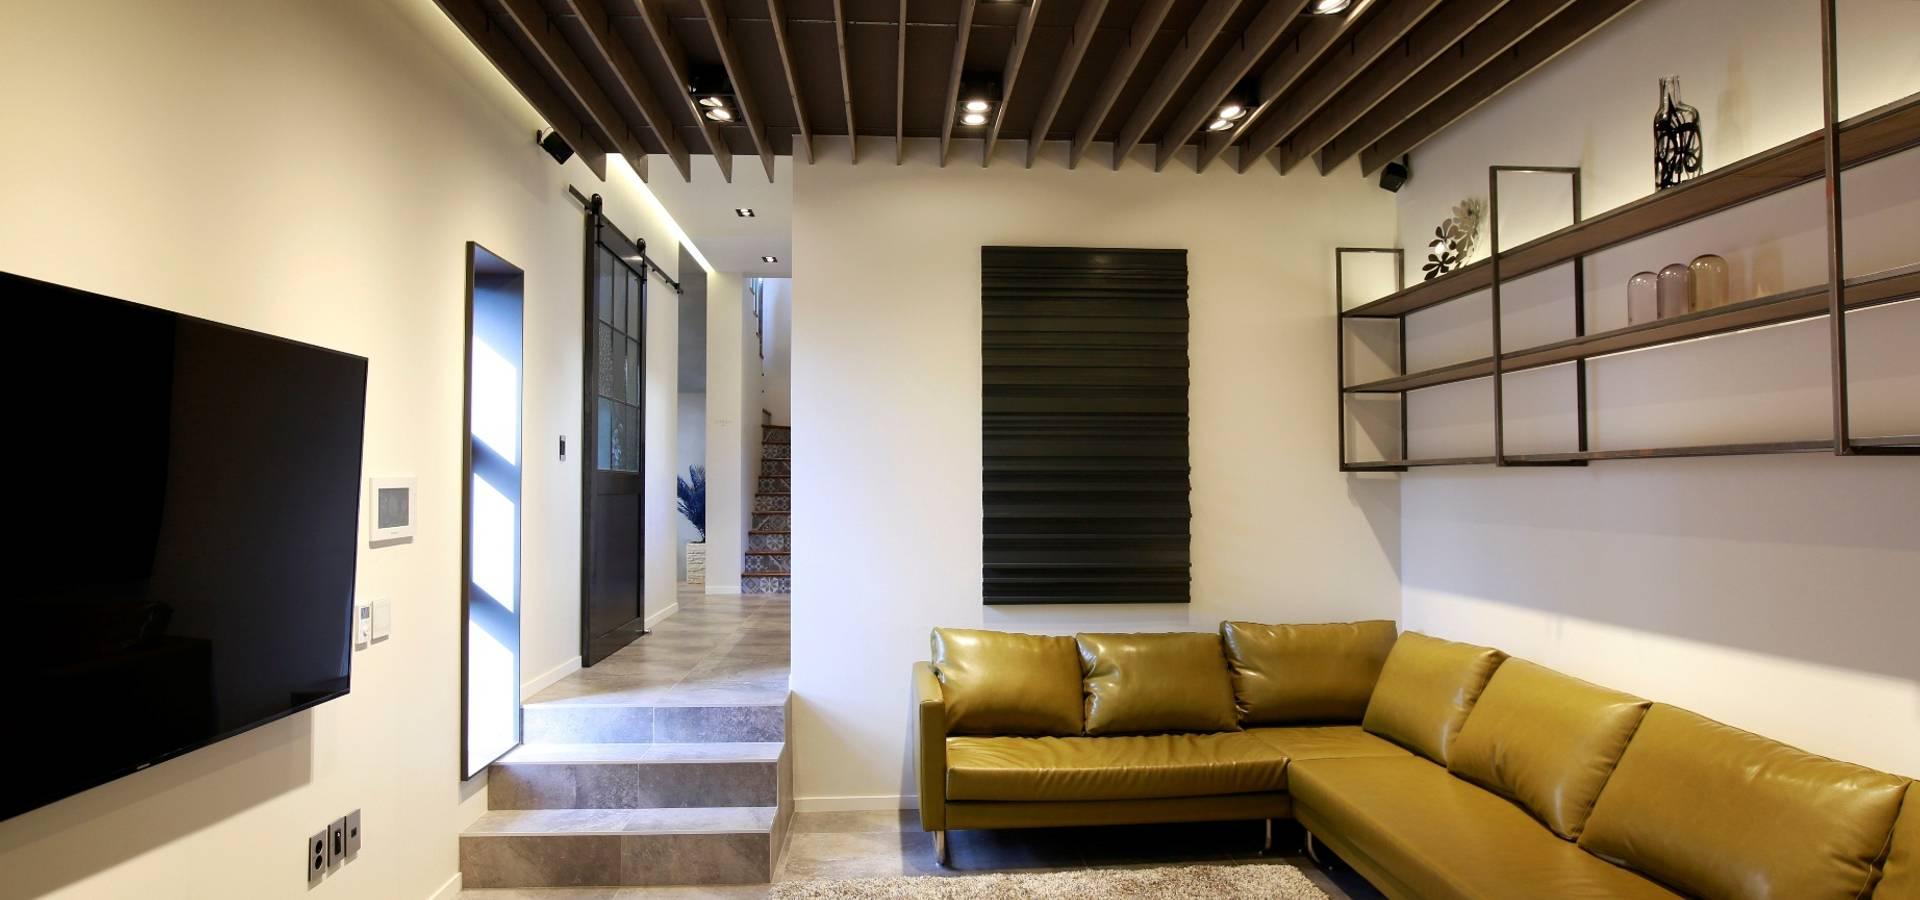 Douglas Minkkinen by Modena Design